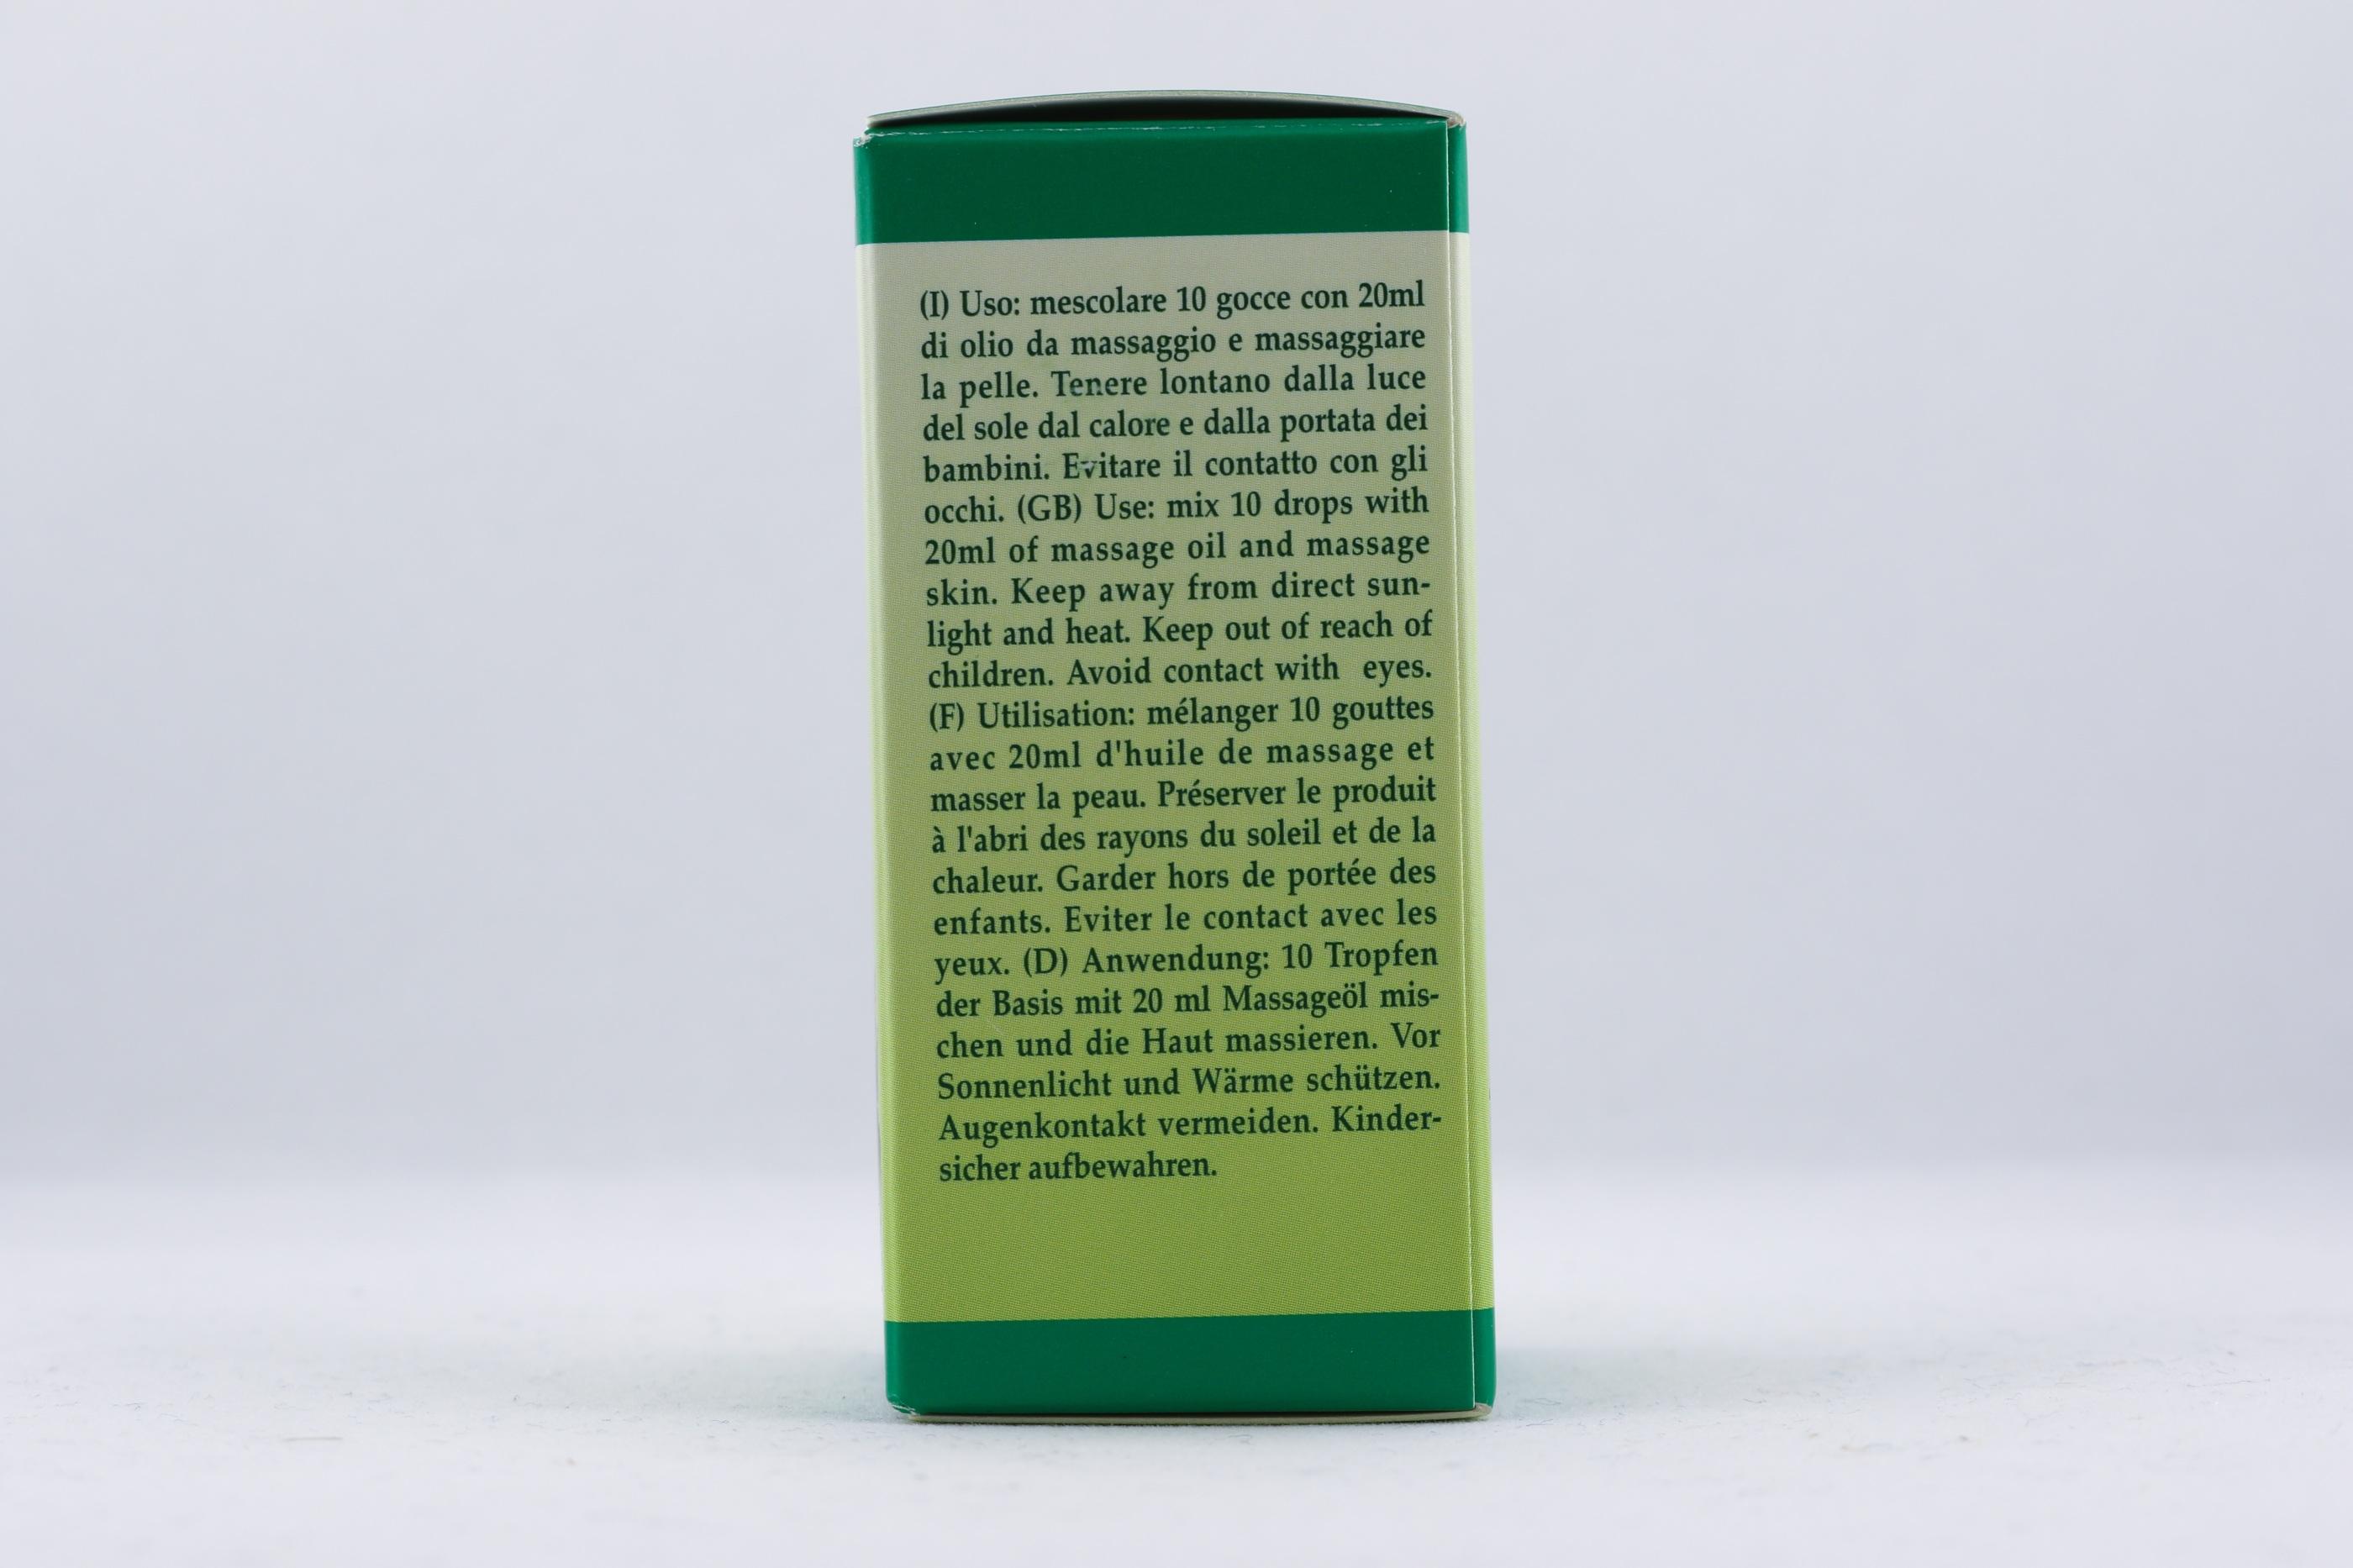 Kanelbark olja wellness ayurveda halmstad sweden svensk eterisk aroma olja